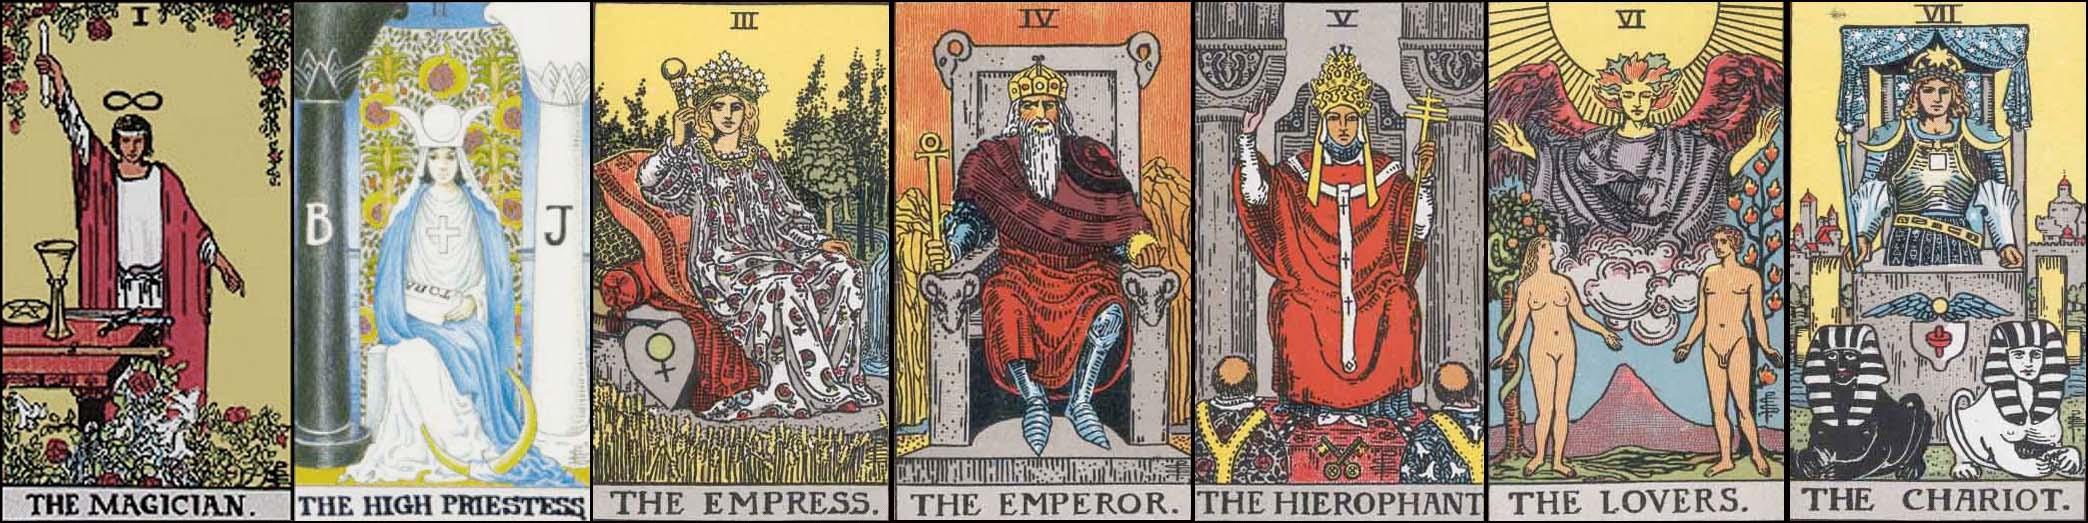 Tarot Card Majors #1 – 7: Long Strange Trip Stage I